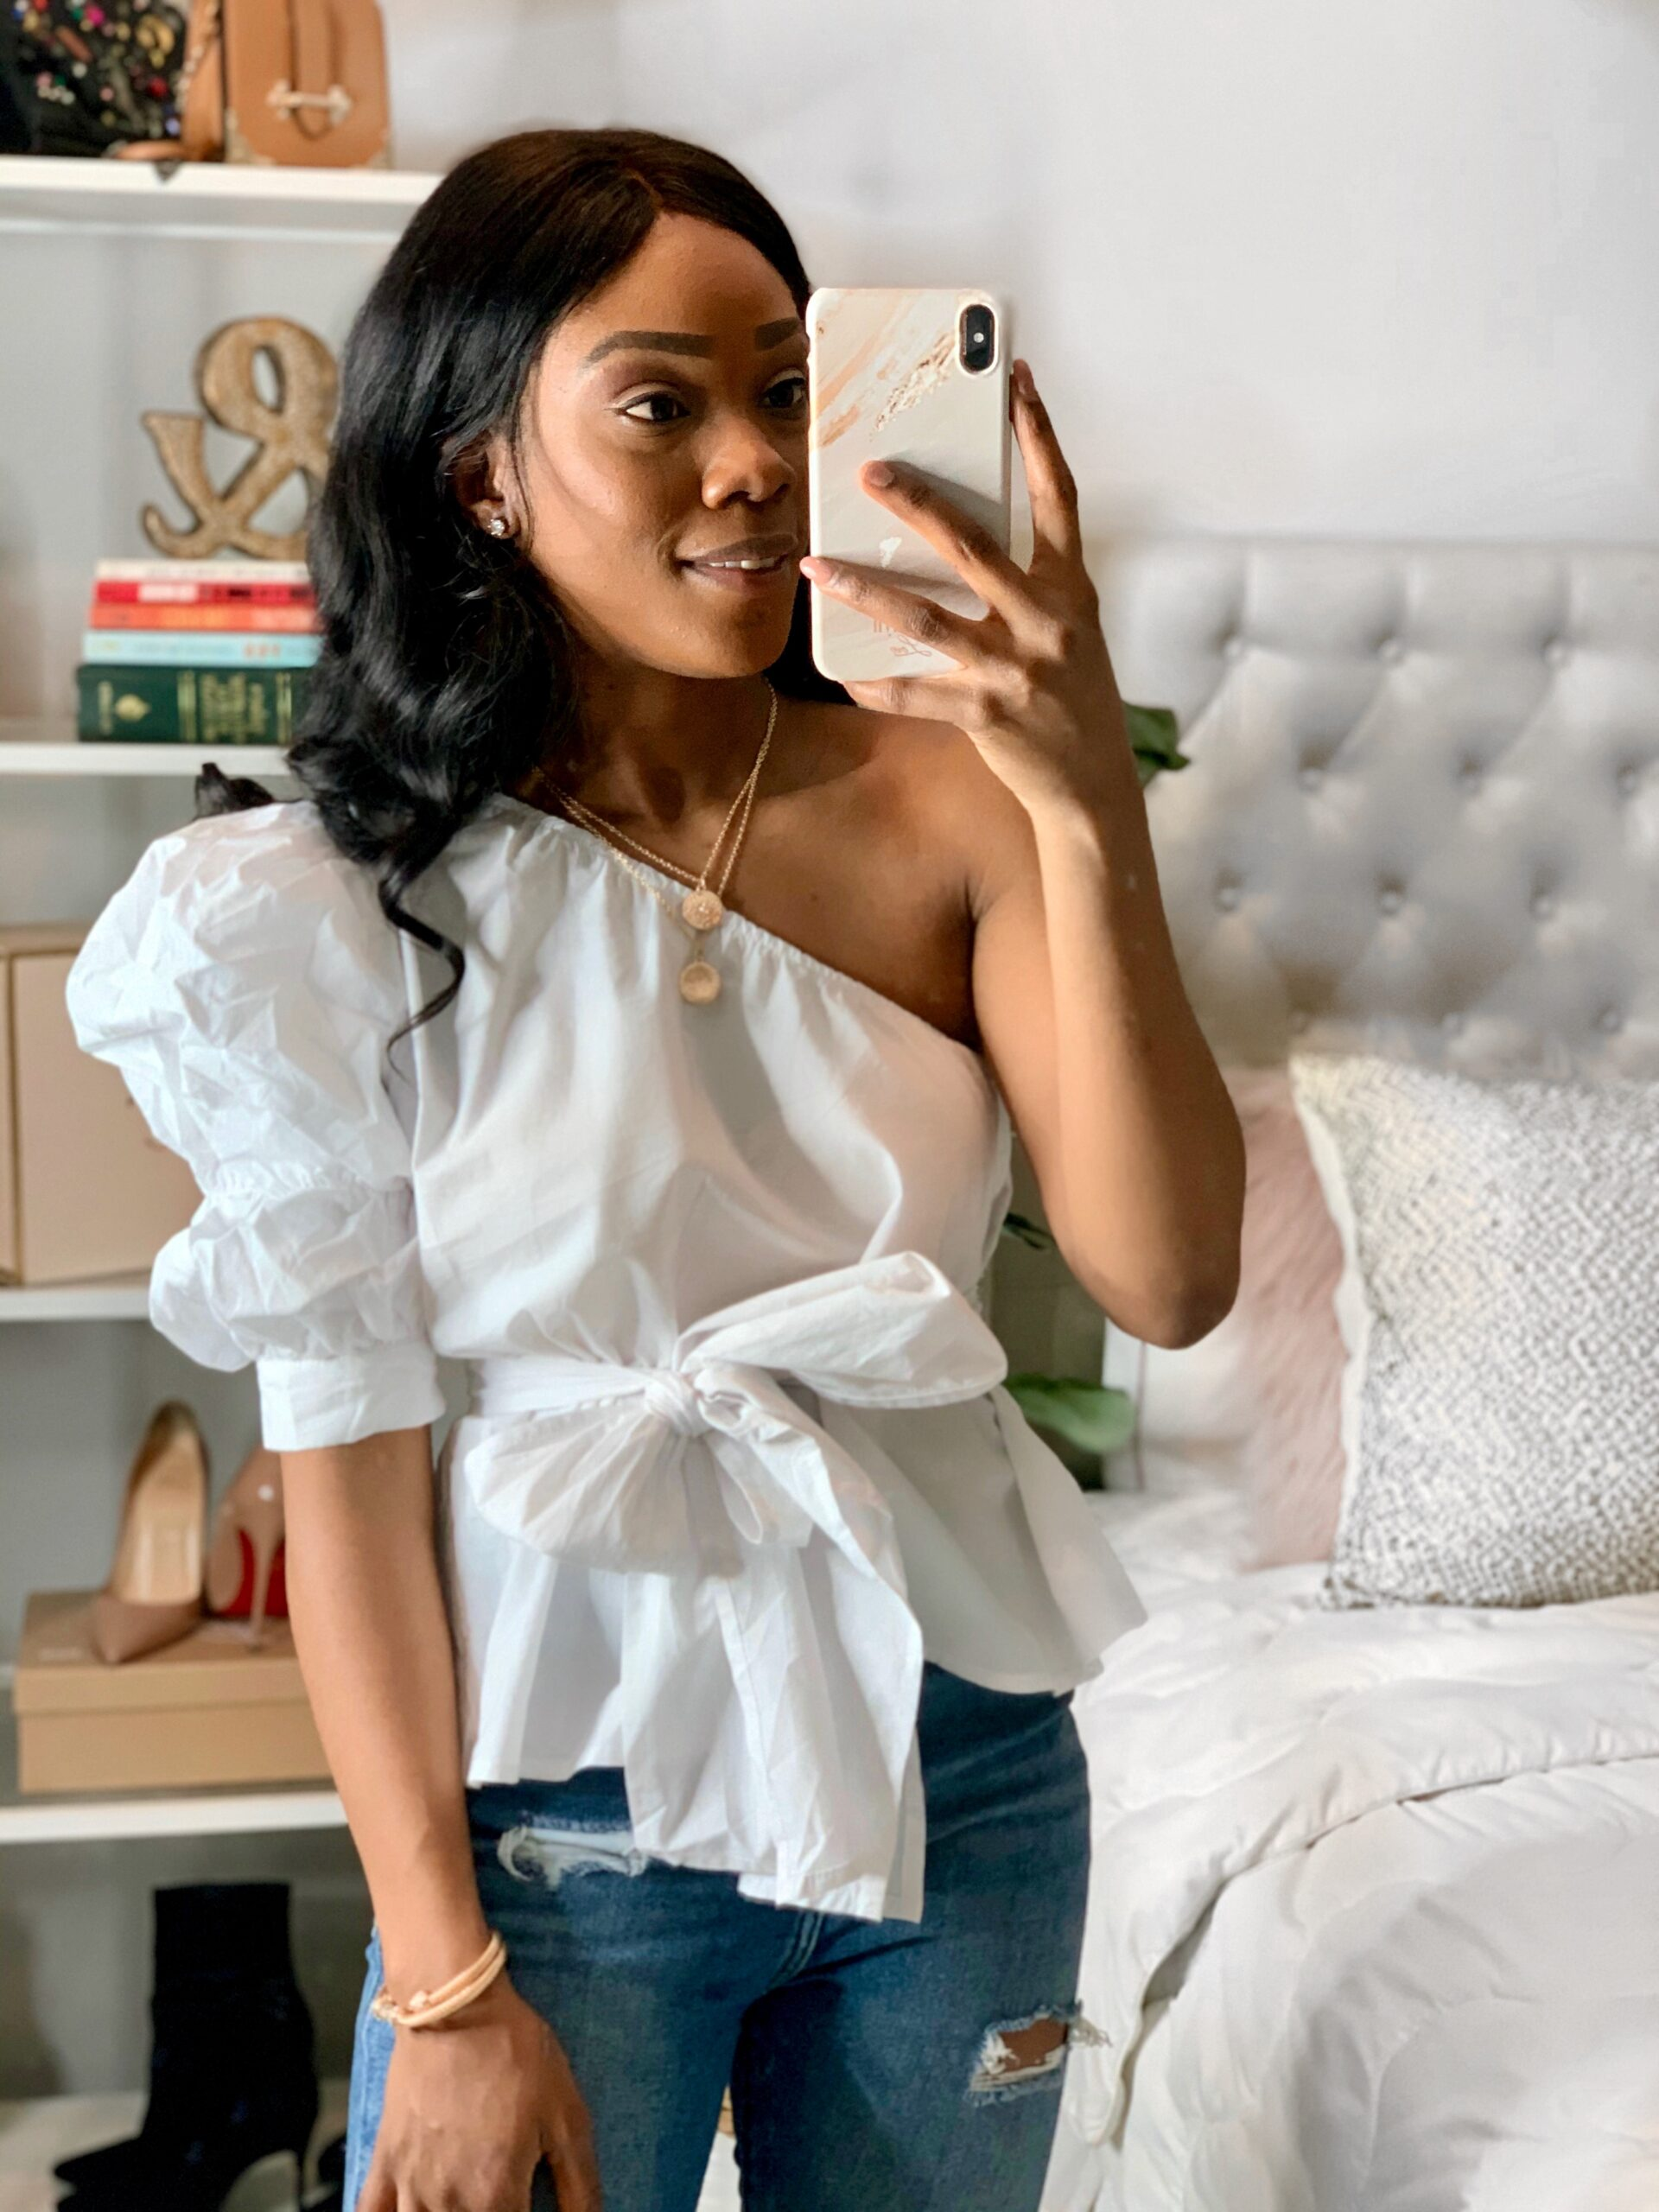 Amazon Fashion Spring 2020 | Women stylish white one shoulder puff sleeves top.